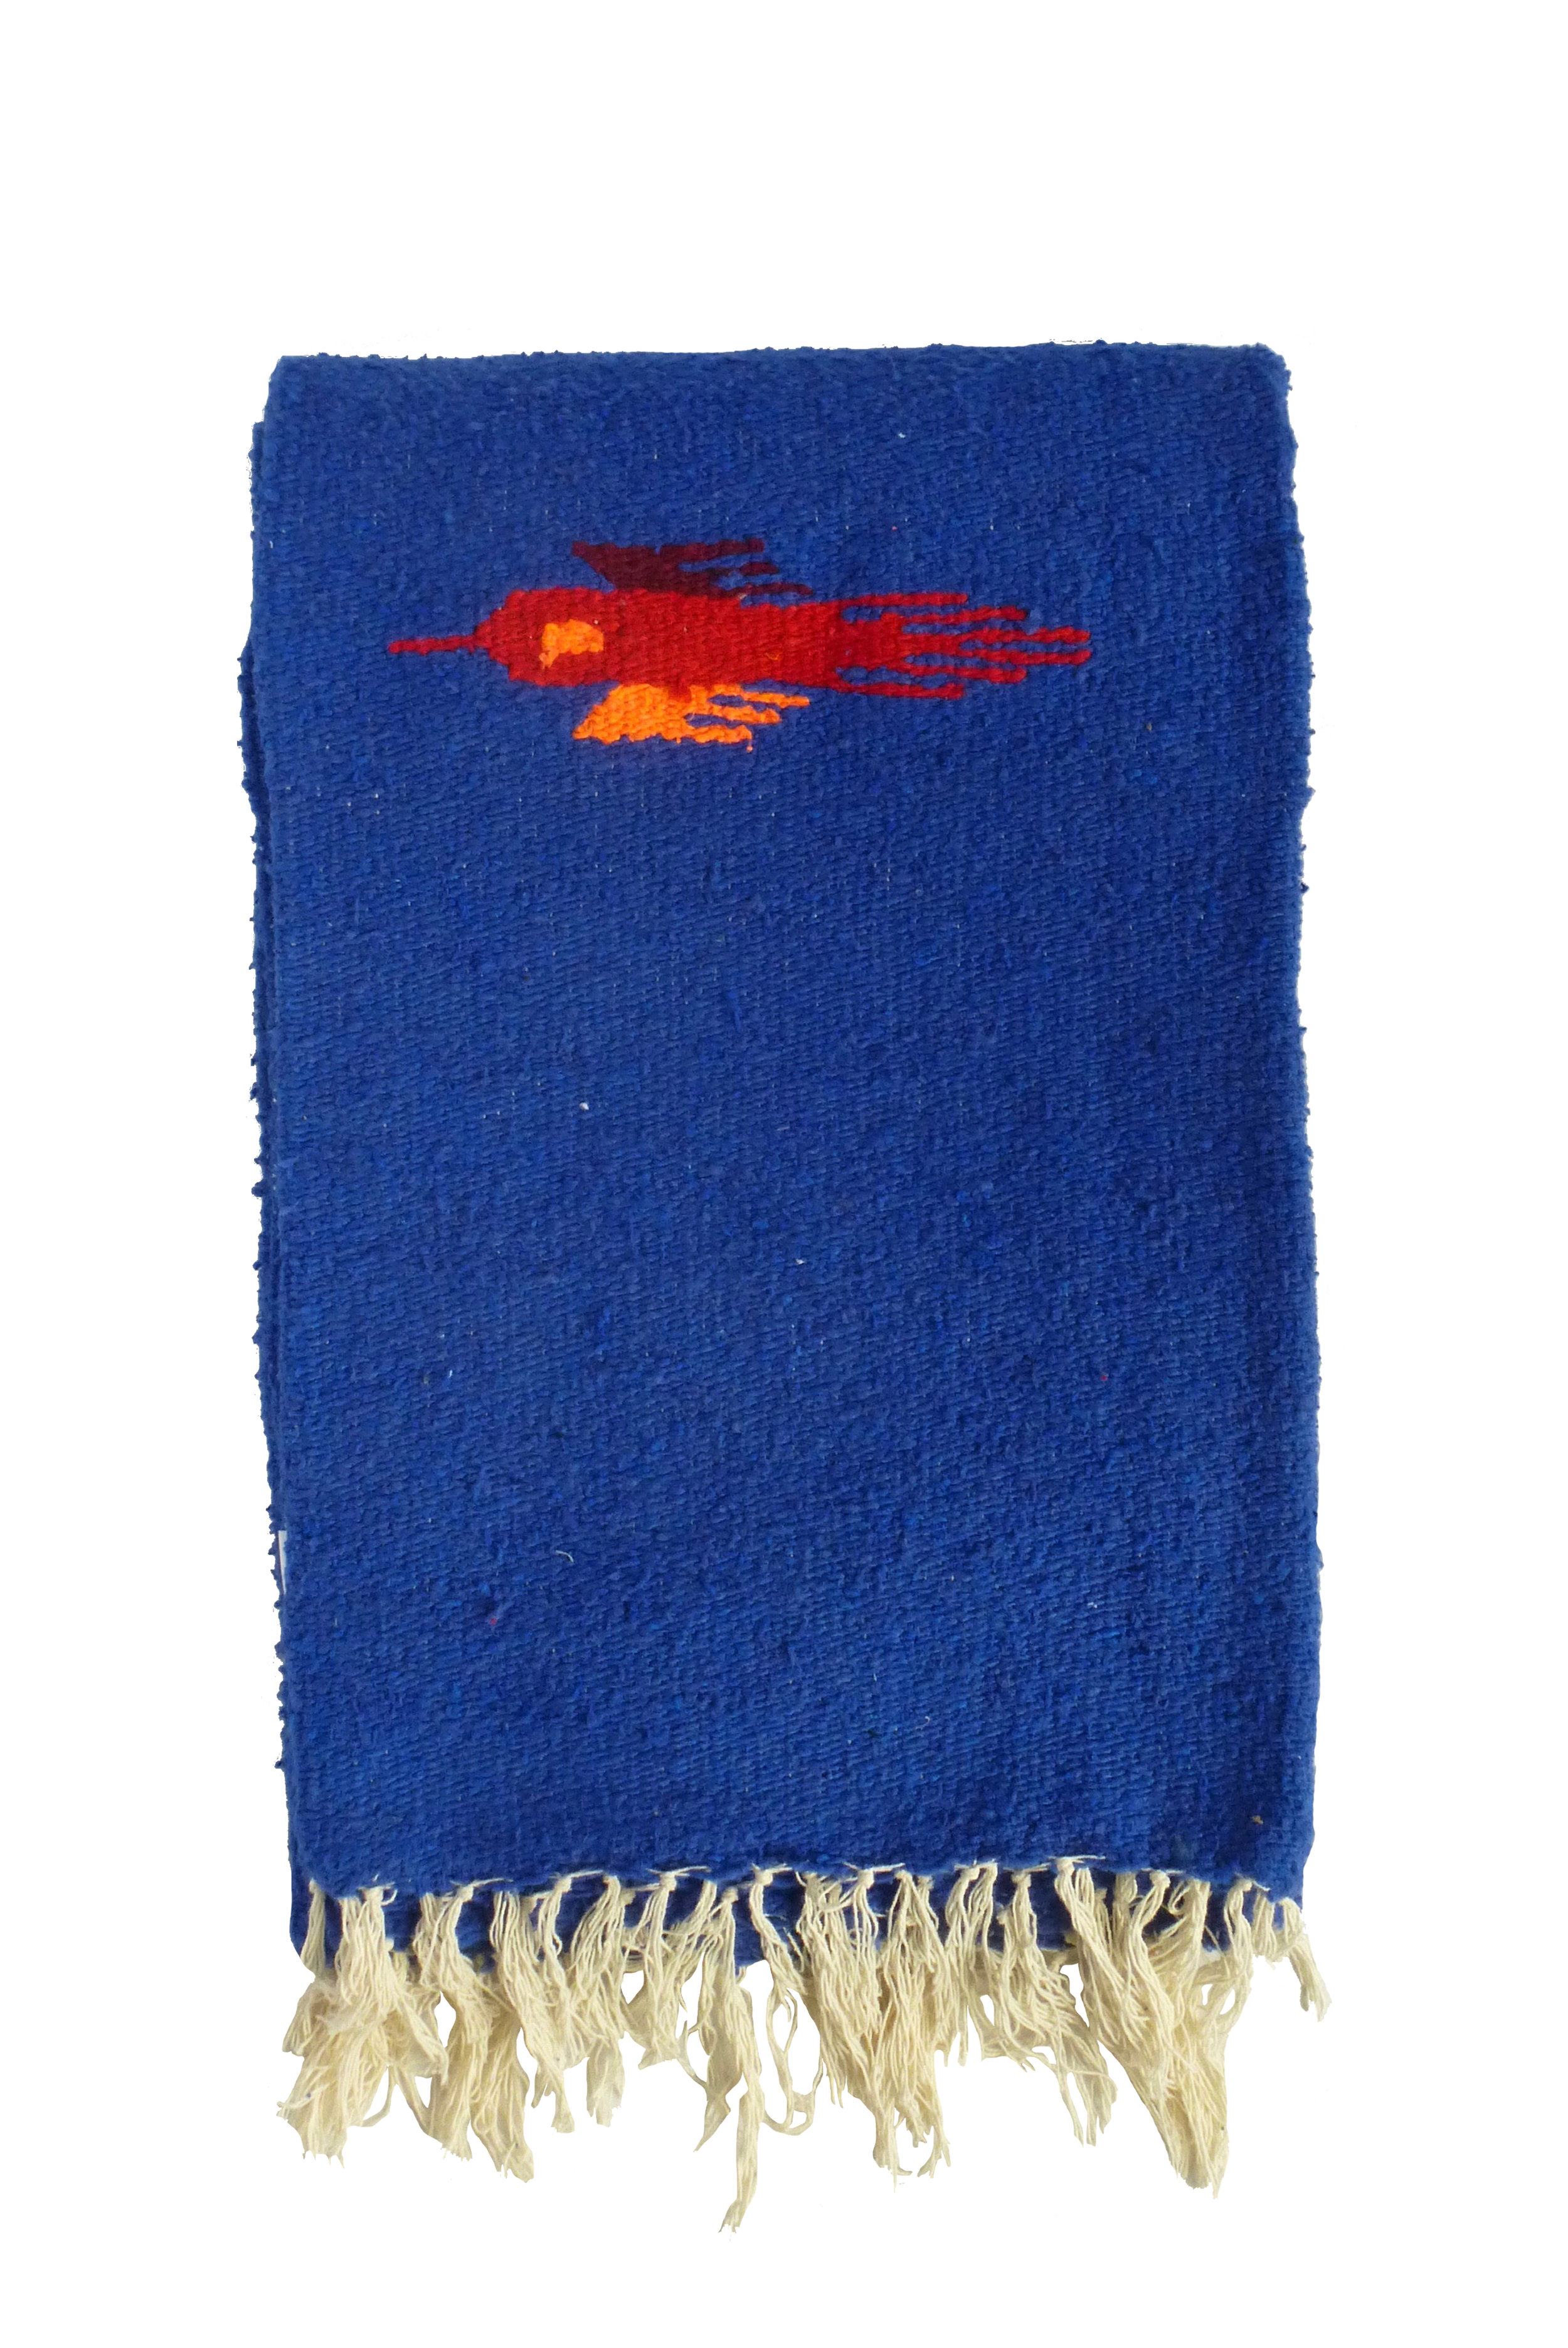 THUNDERBIRD BLANKET - ROYAL BLUE